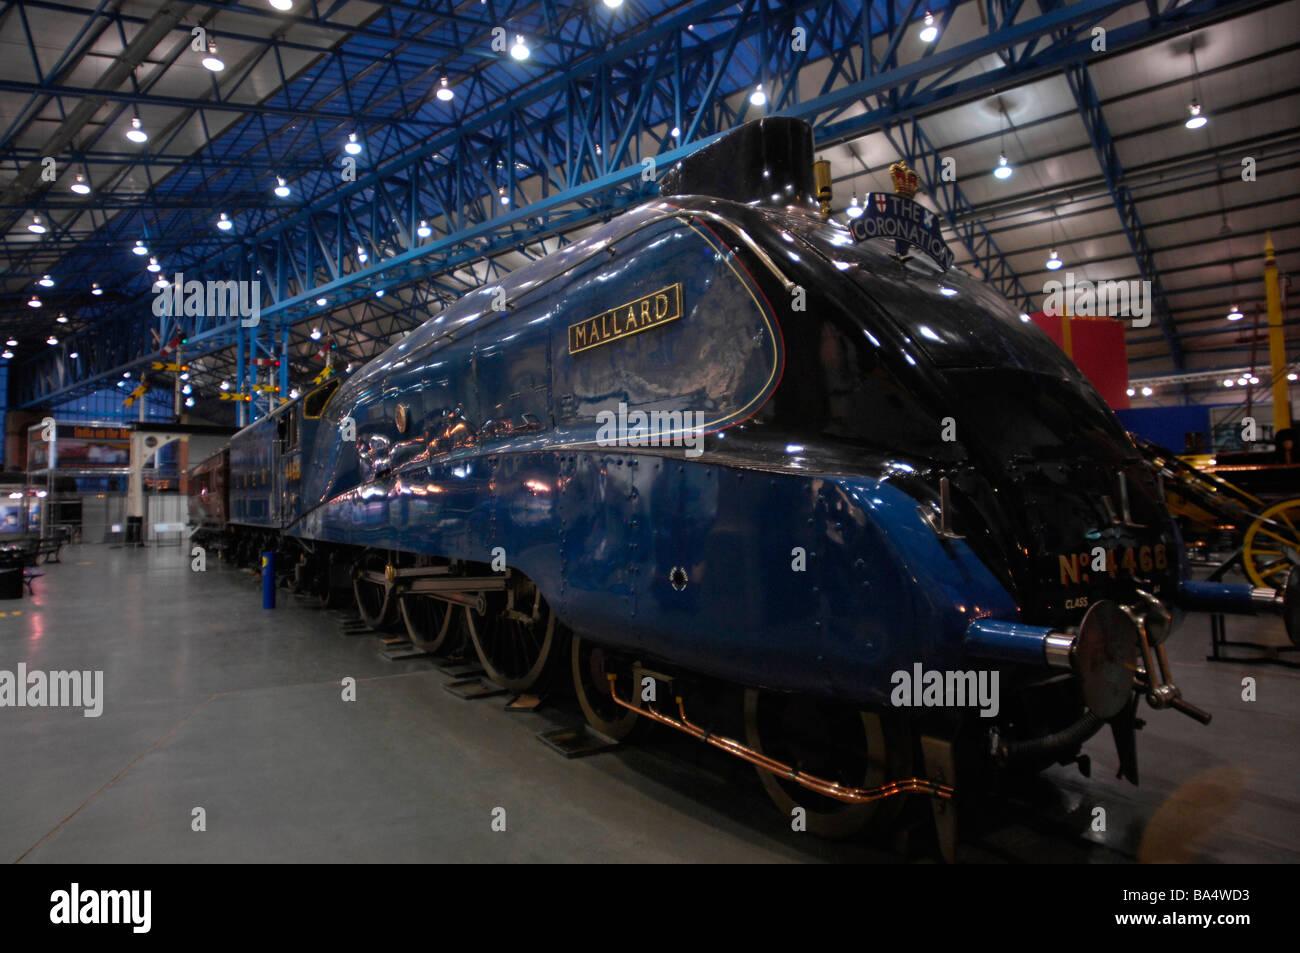 Mallard, the LNER steam train, at the National Railway museum, York - Stock Image